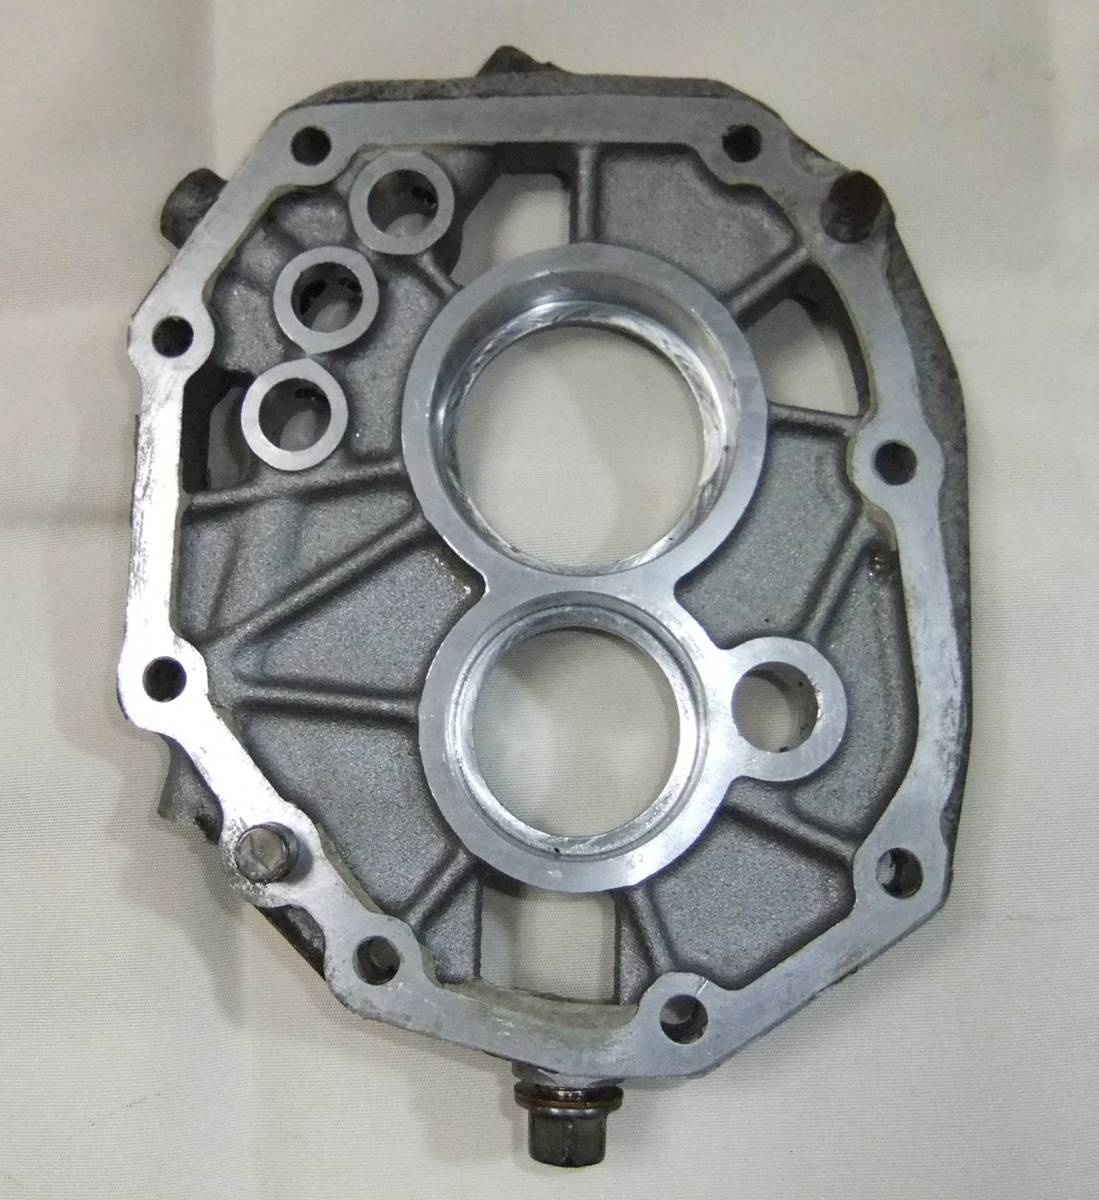 Adapter Plate 56